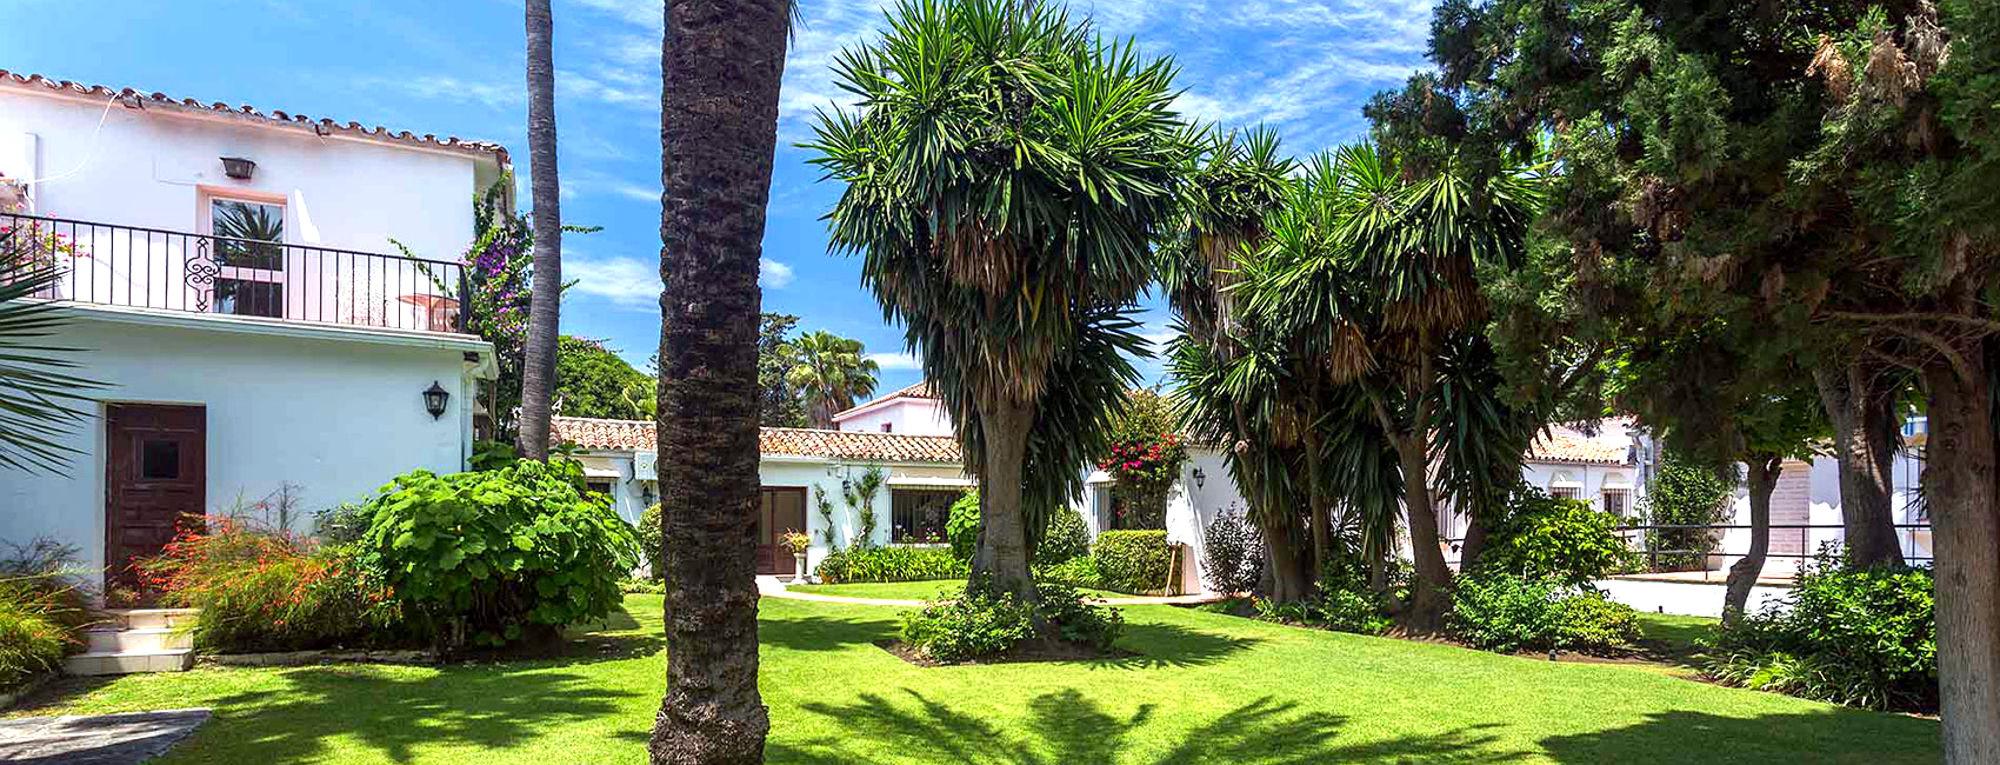 Drug Rehab Center in Marbella - Buildings & Trees